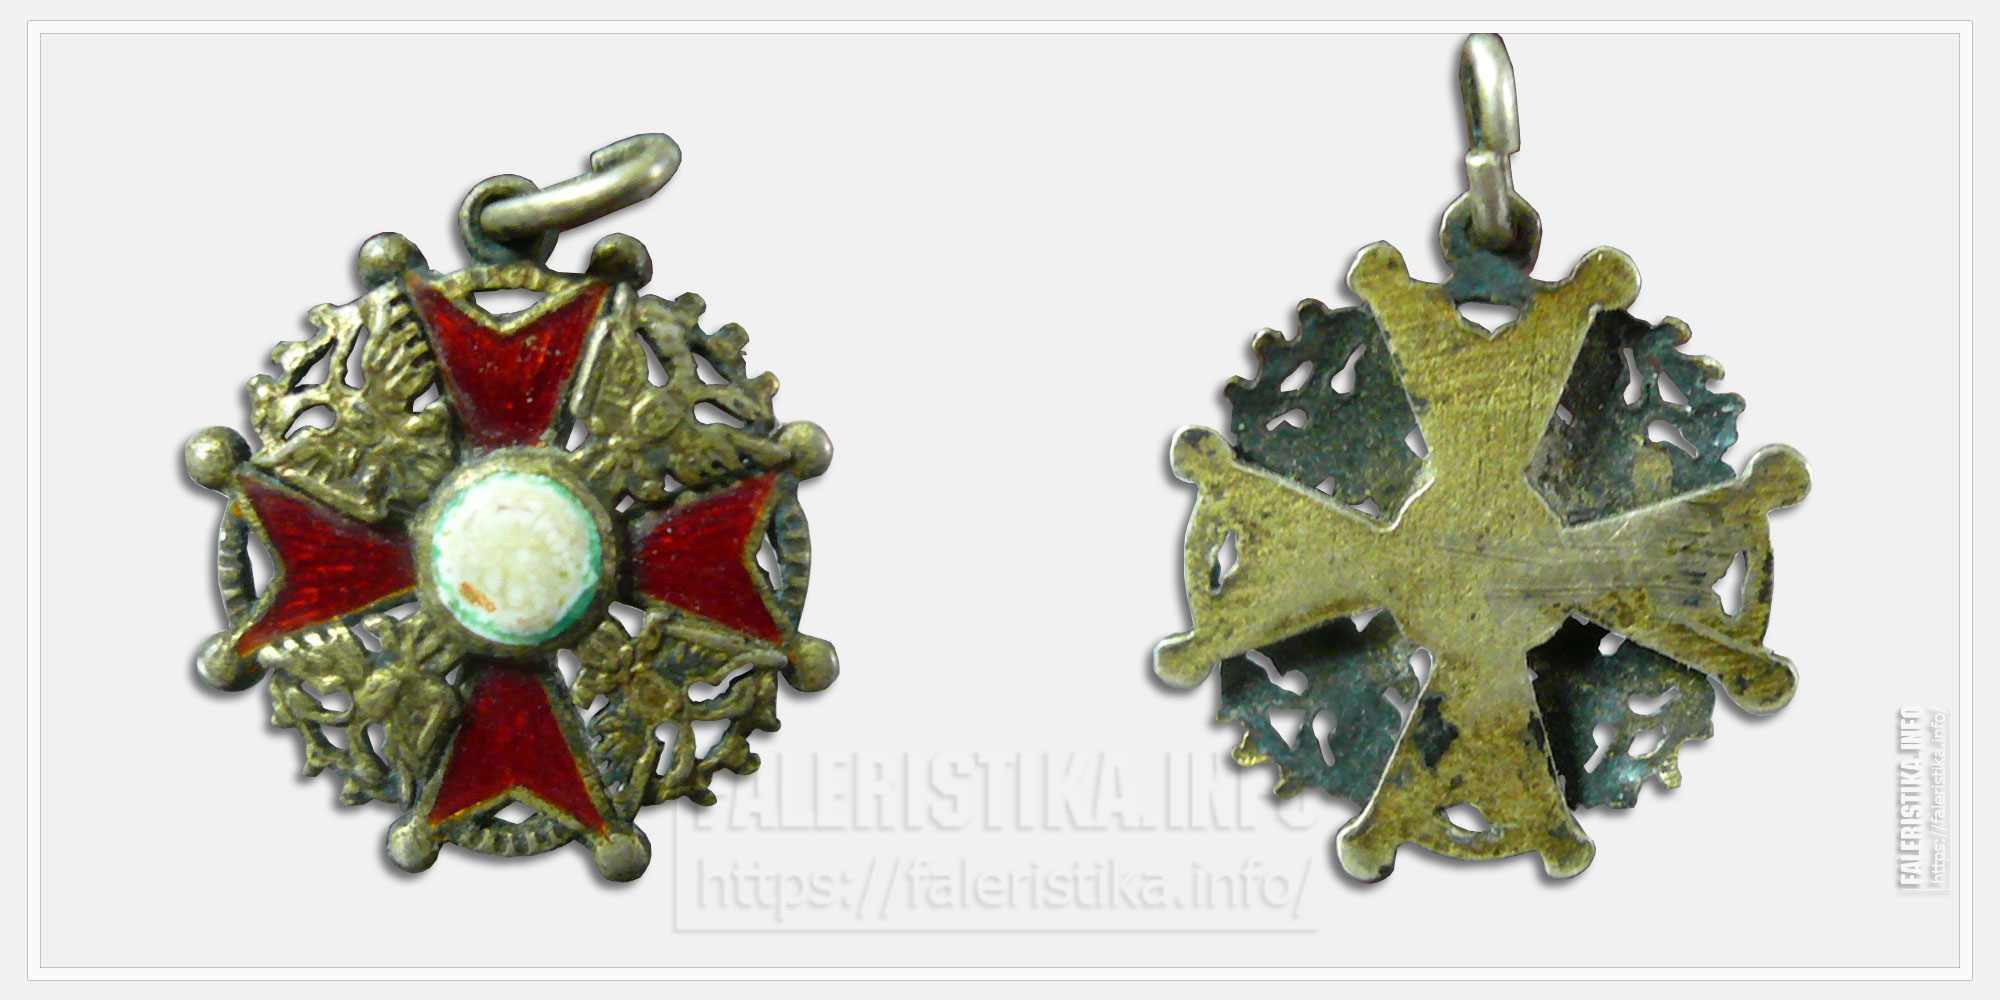 Знак ордена Святого Станислава Миниатюра (фрачник)